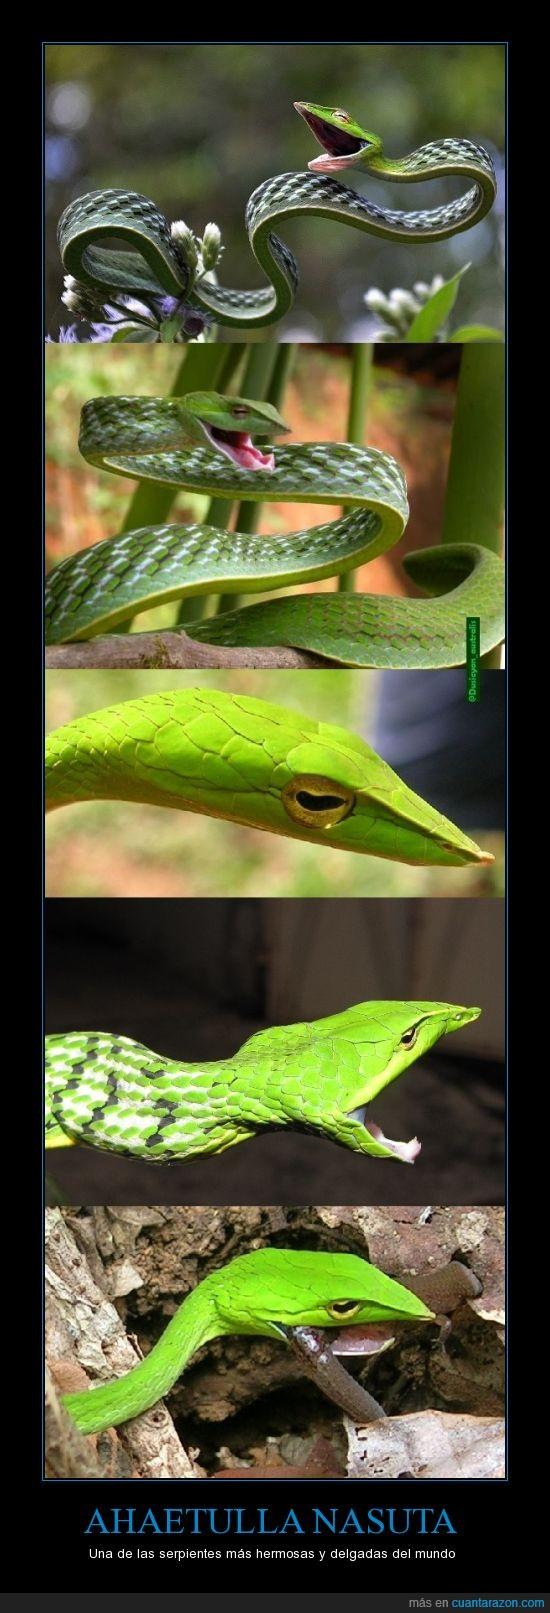 Ahaetulla nasuta,delgada,India,Mundo,serpiente